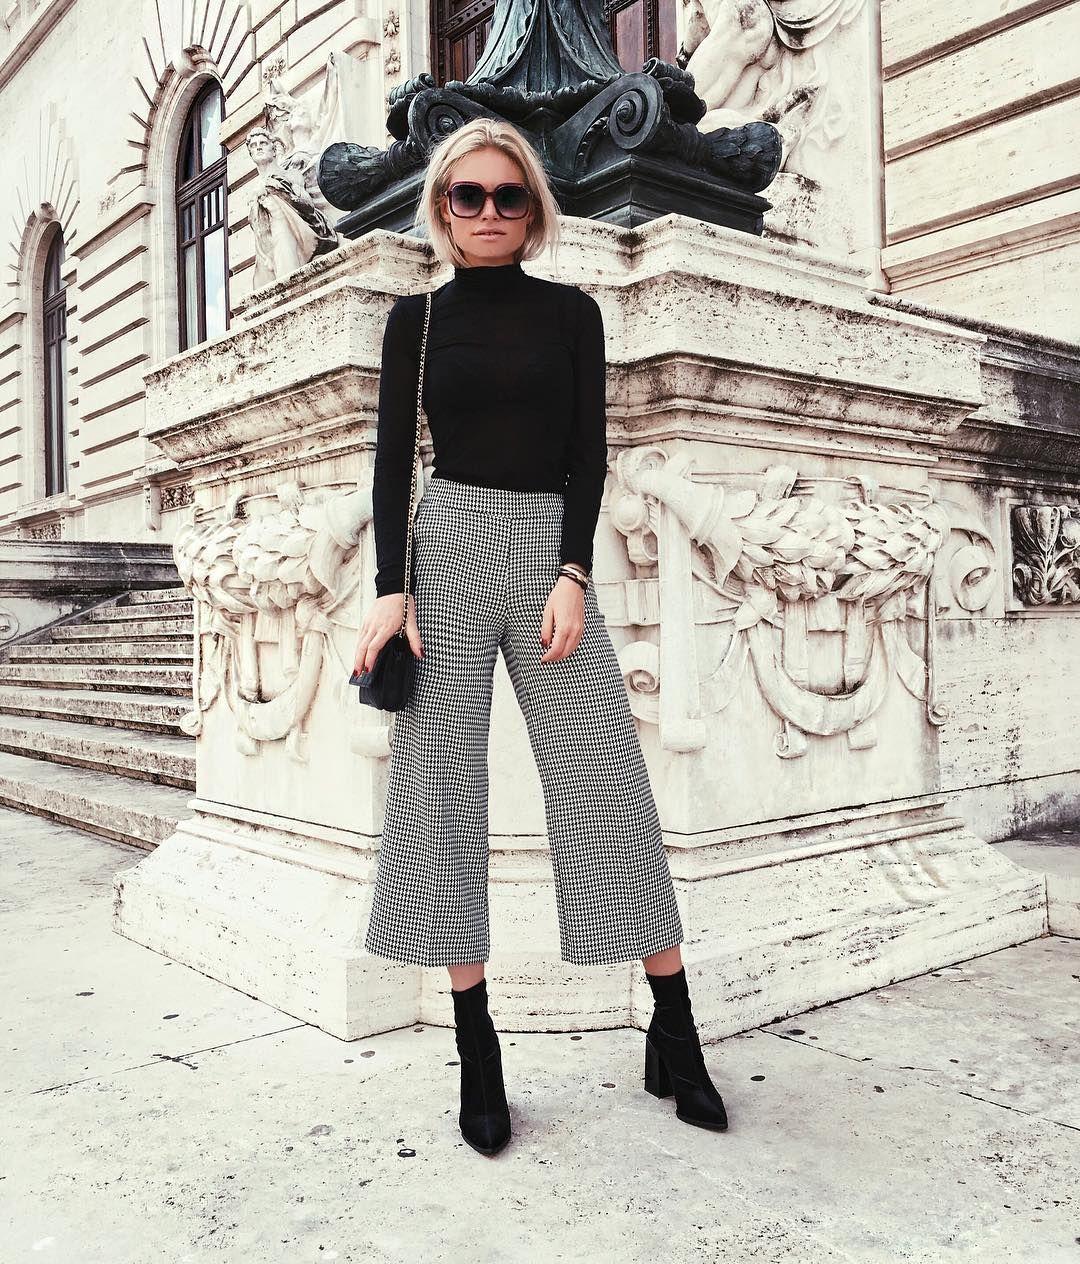 Coole herfst outfit inspiratie van fashion bloggers | TrendAlert